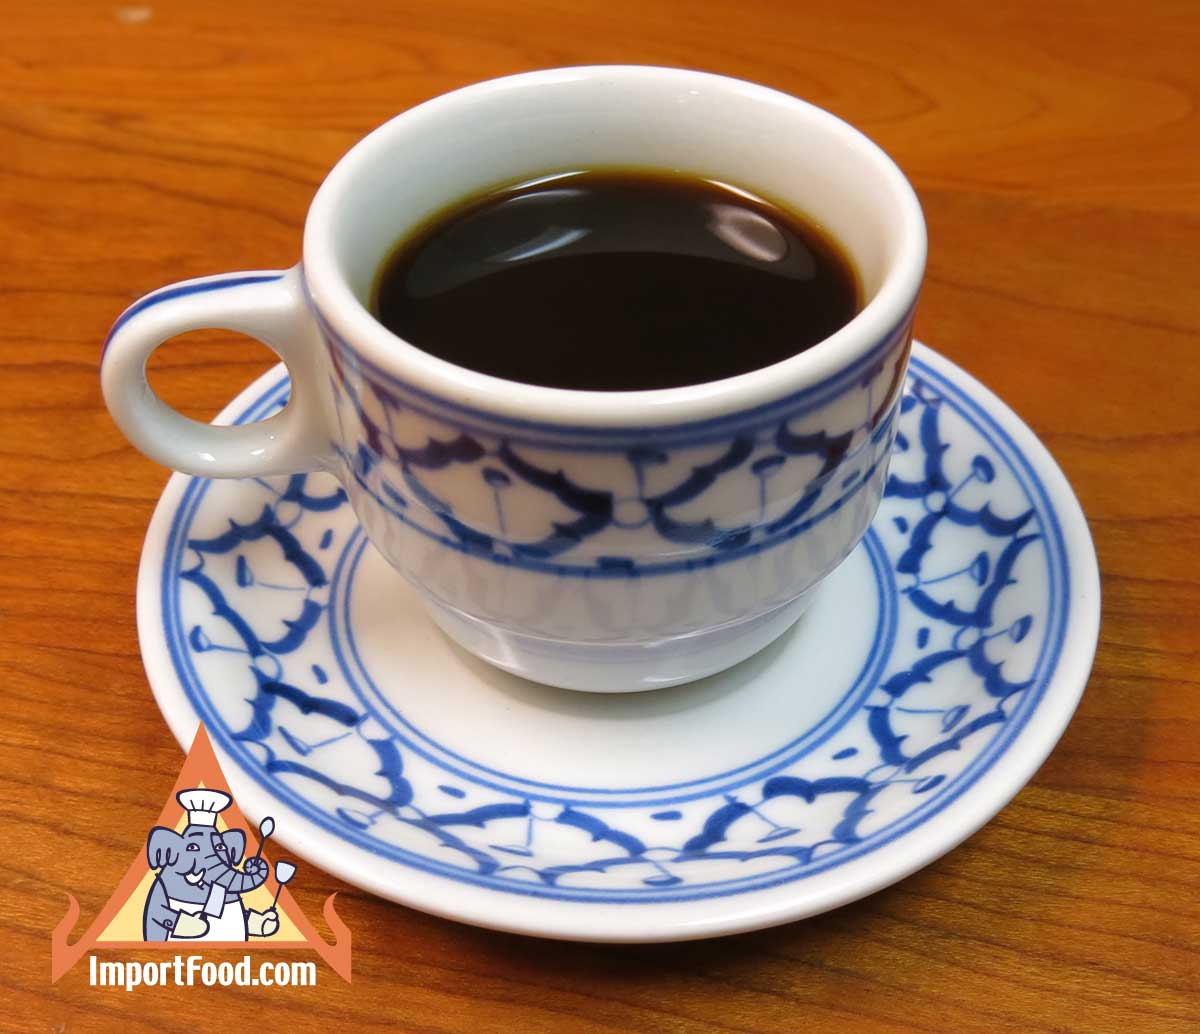 Thai Ceramic Small Cup Amp Saucer Importfood